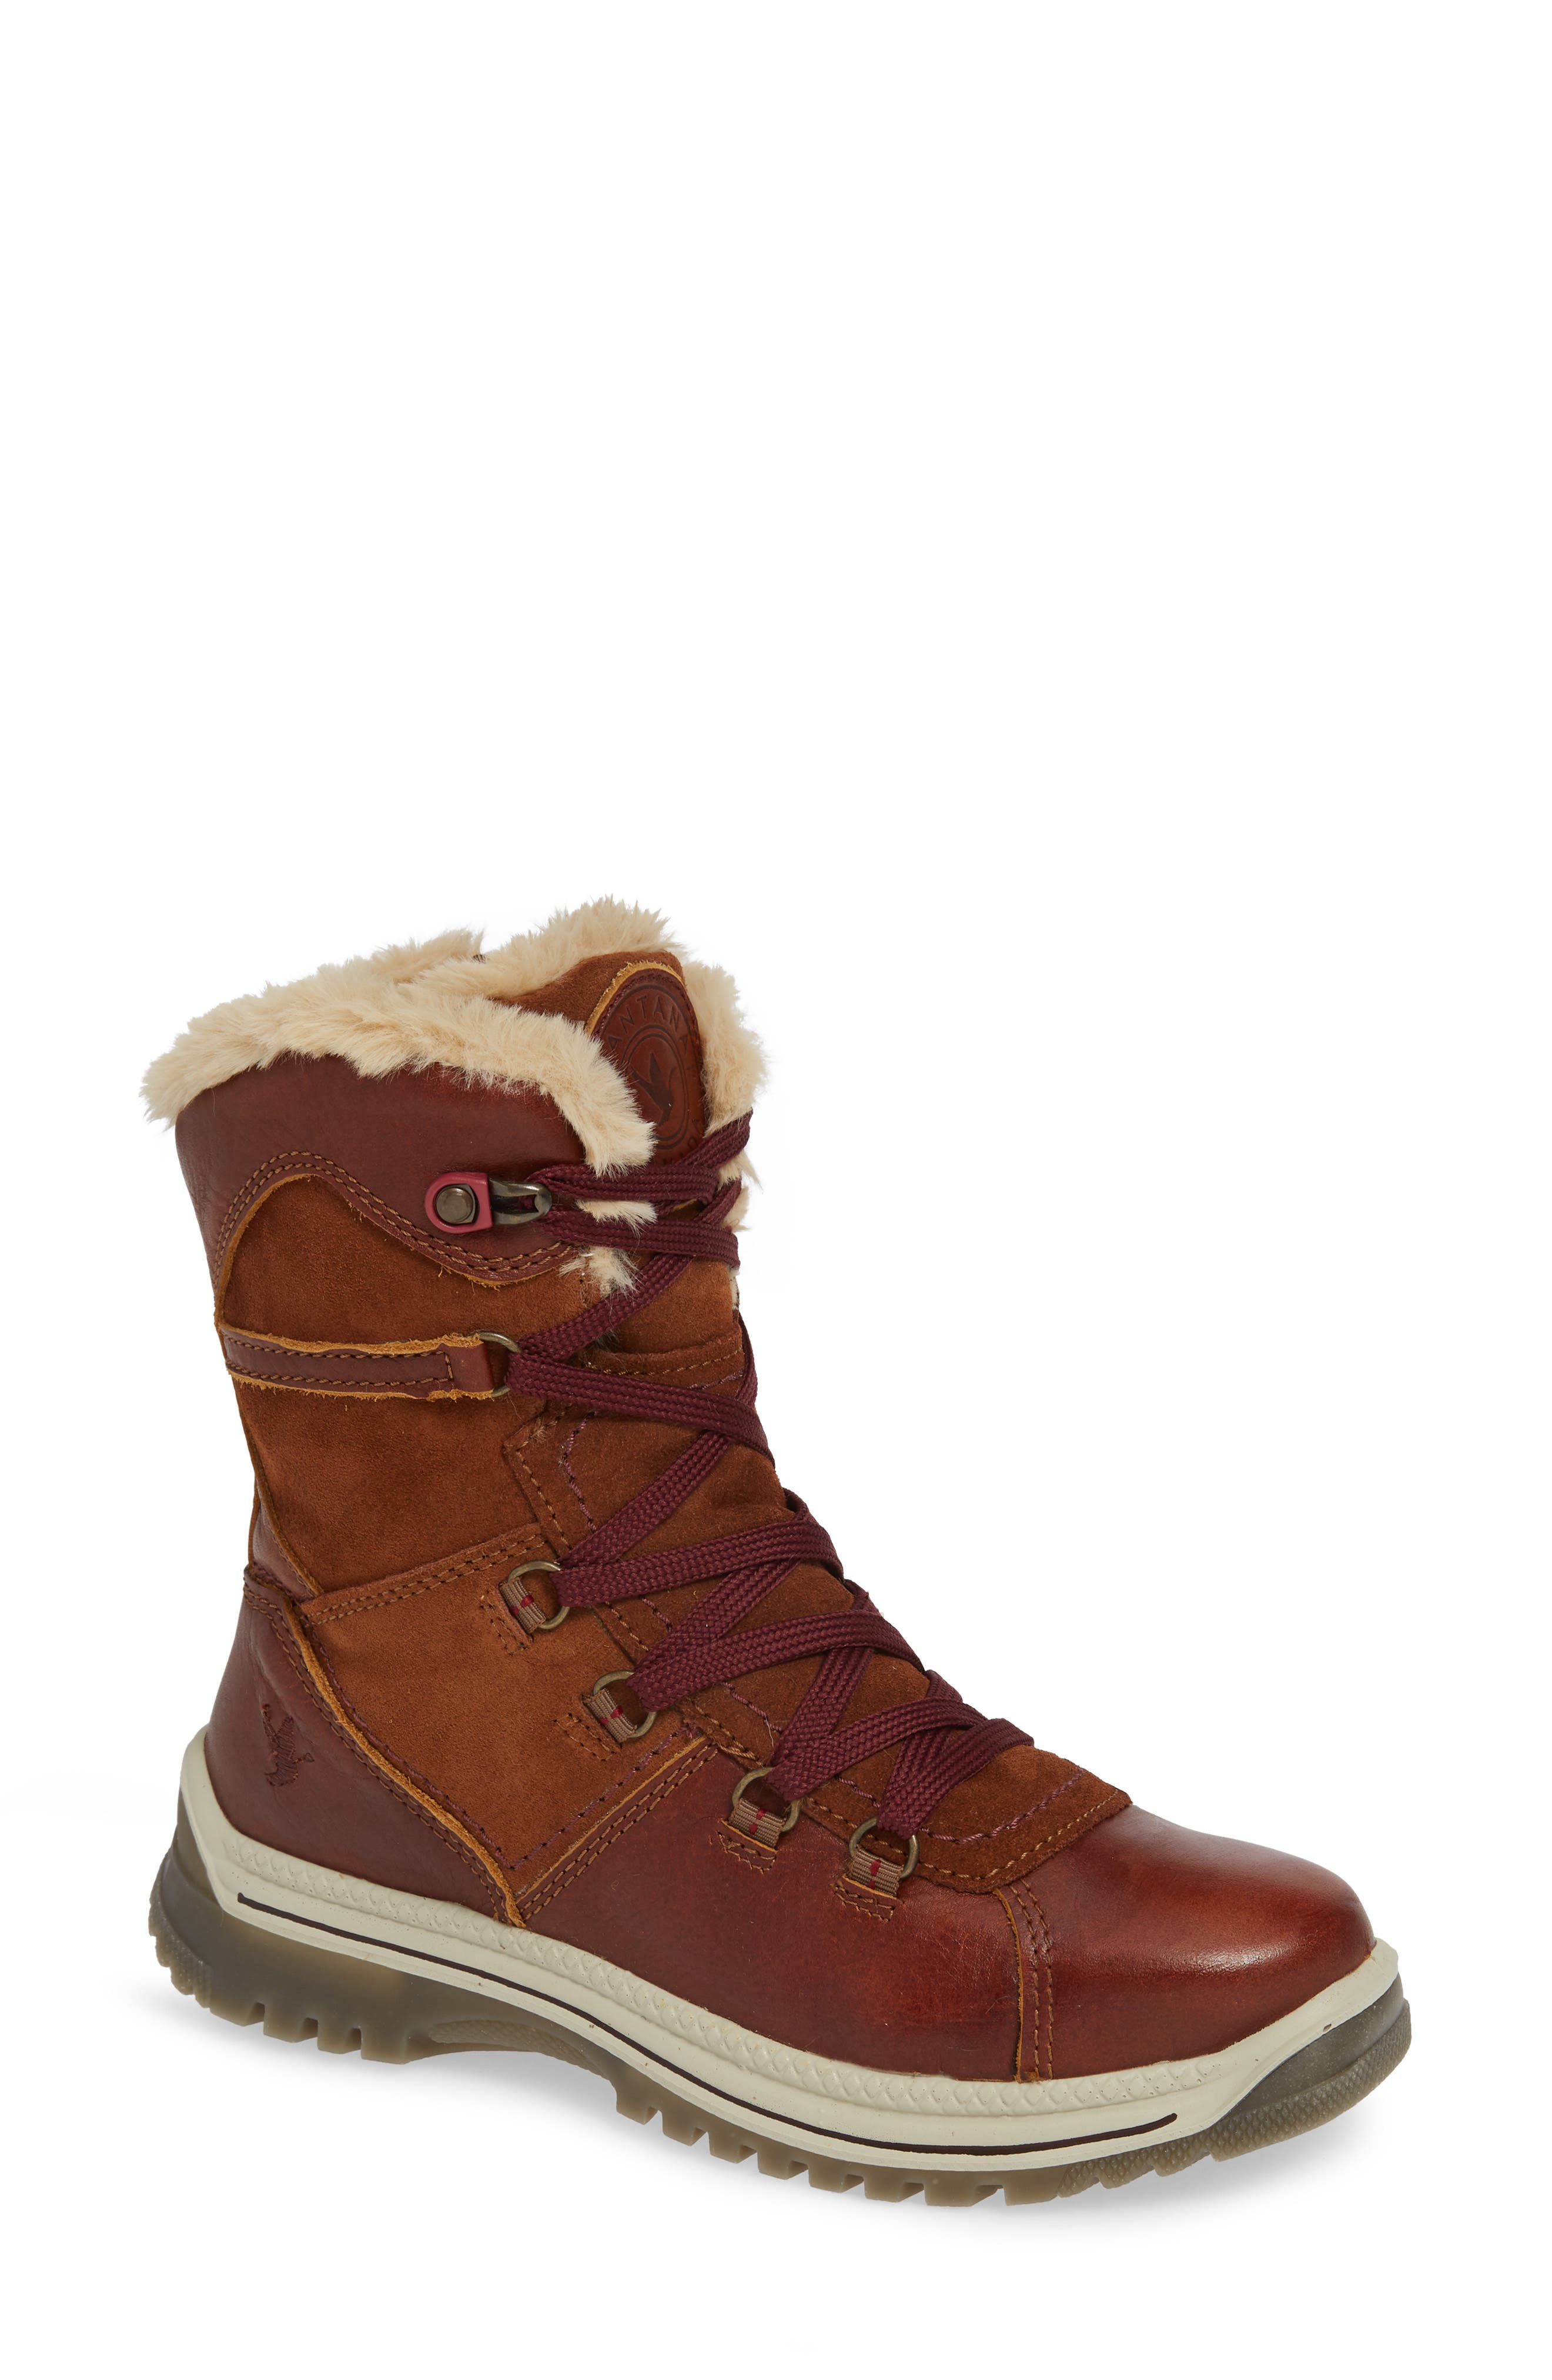 Santana Canada Majesta Luxe Waterproof Winter Boot